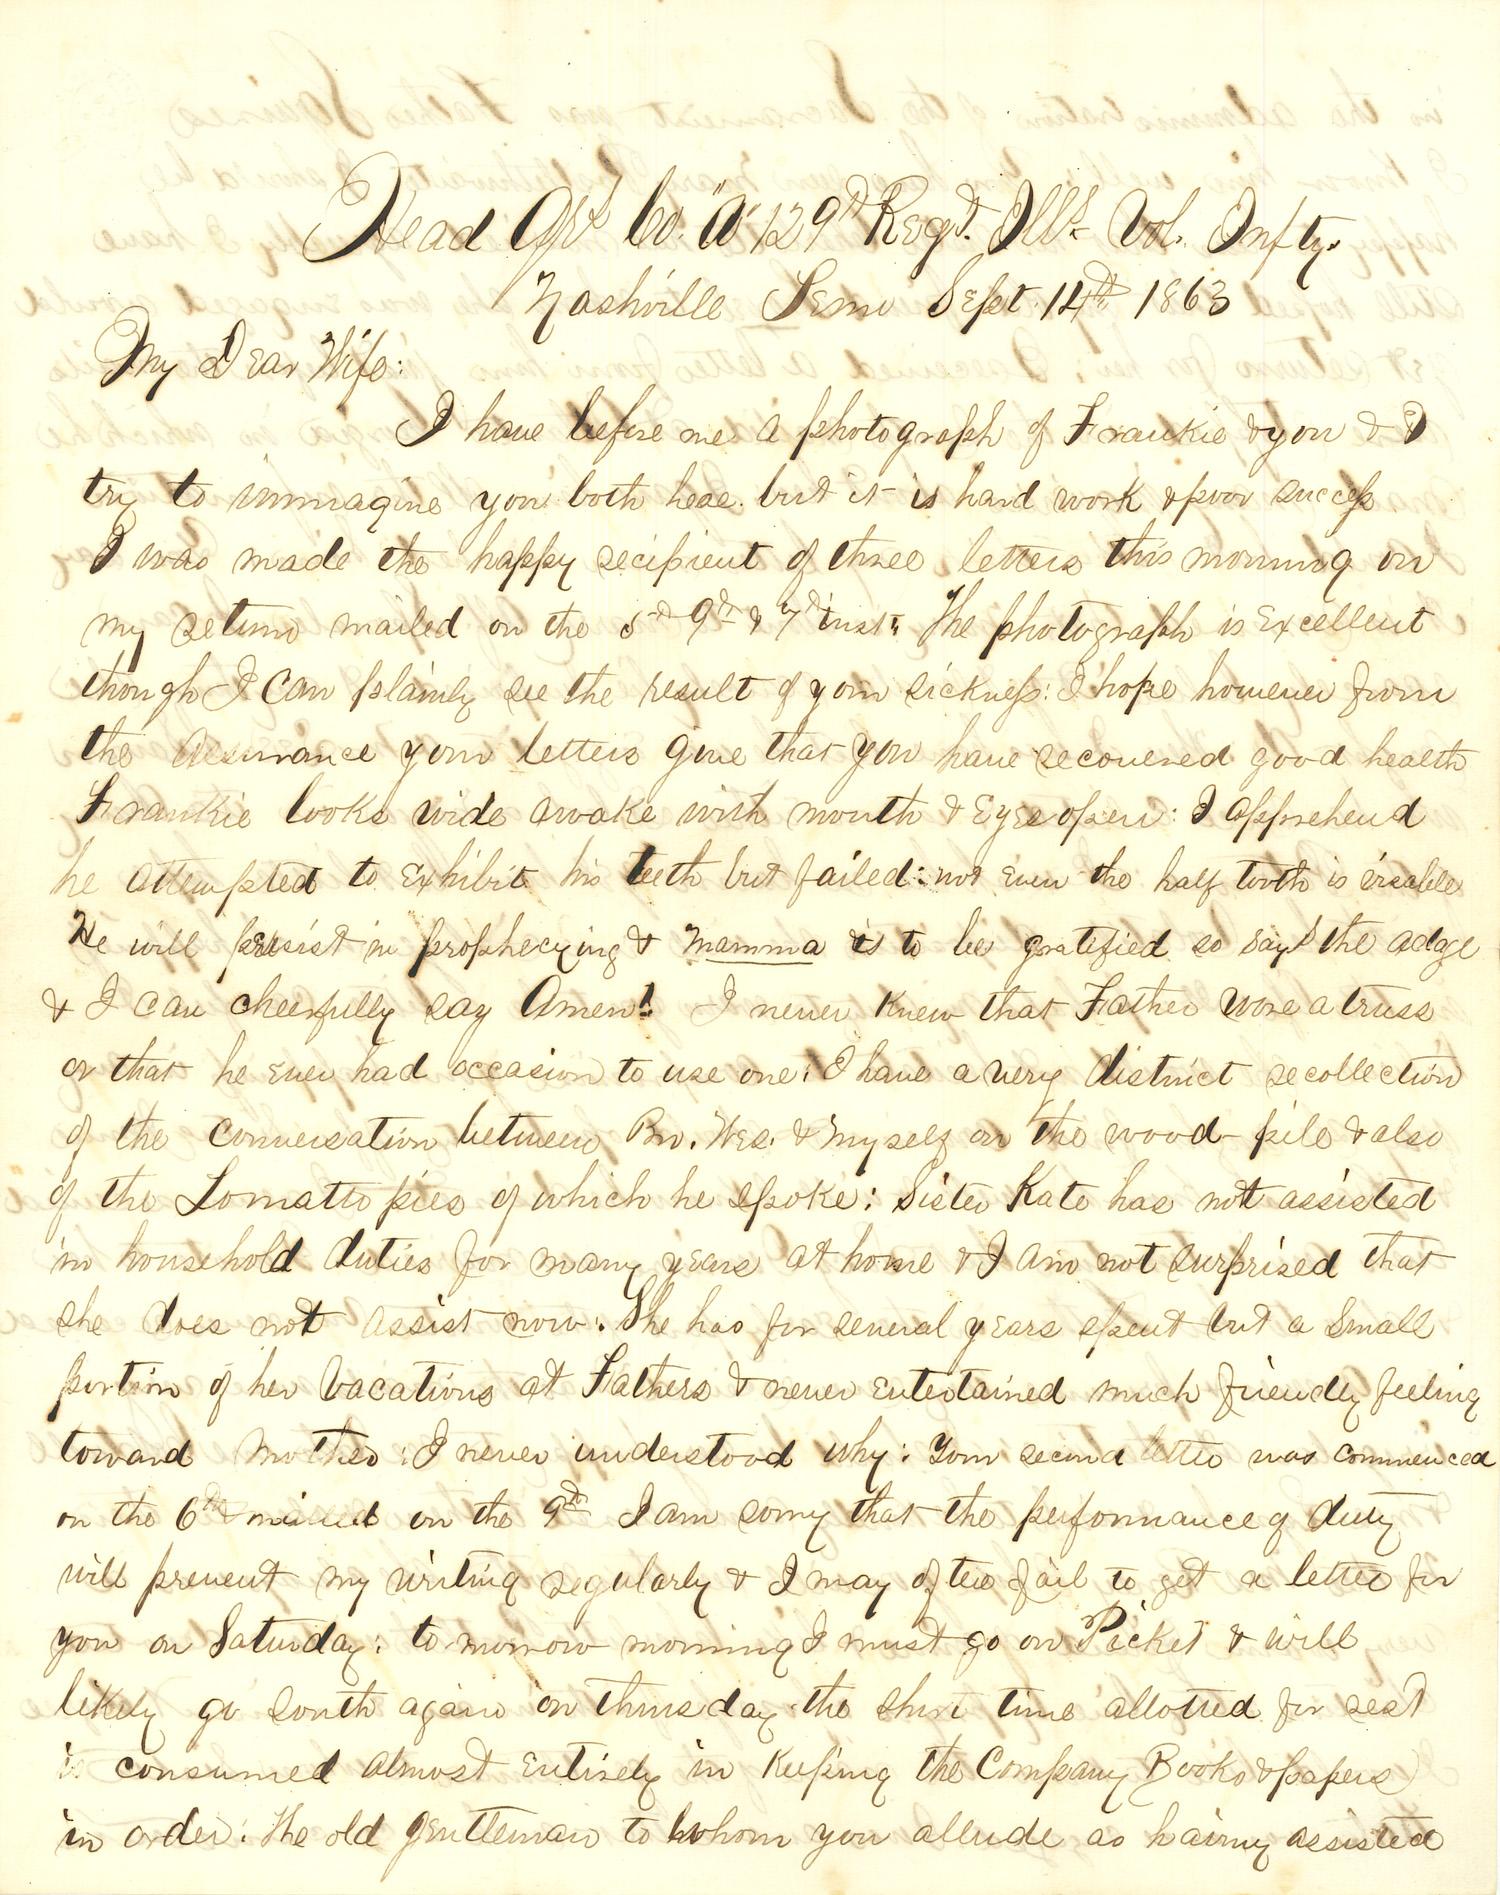 Joseph Culver Letter, September 14, 1863, Page 1